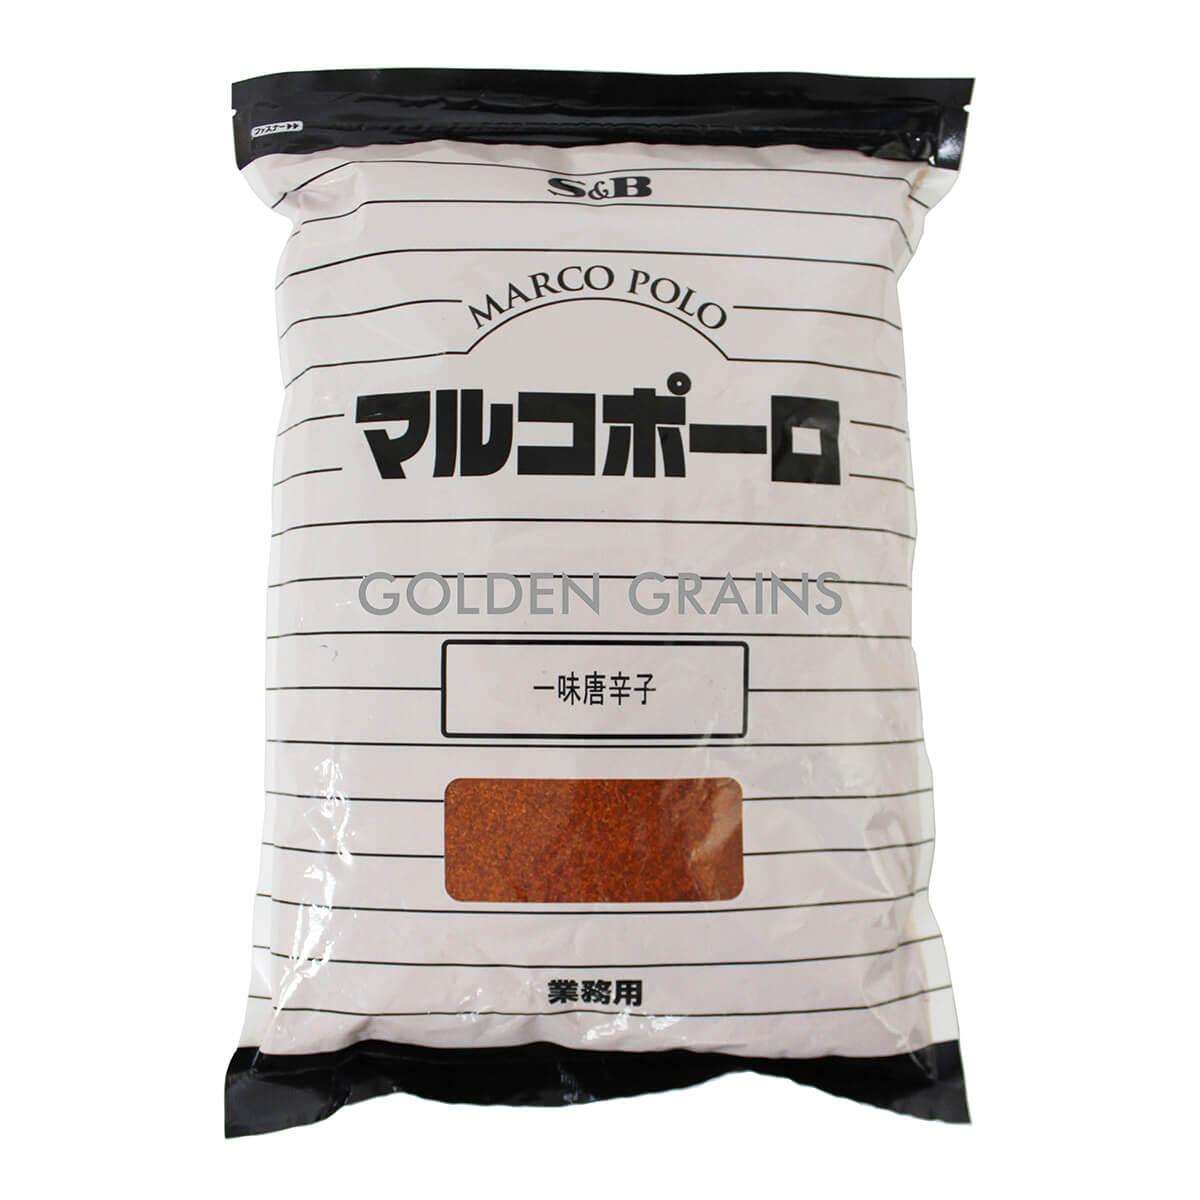 Golden Grains S&B - Chilli Powder - Japan - 1kg - Front.jpg